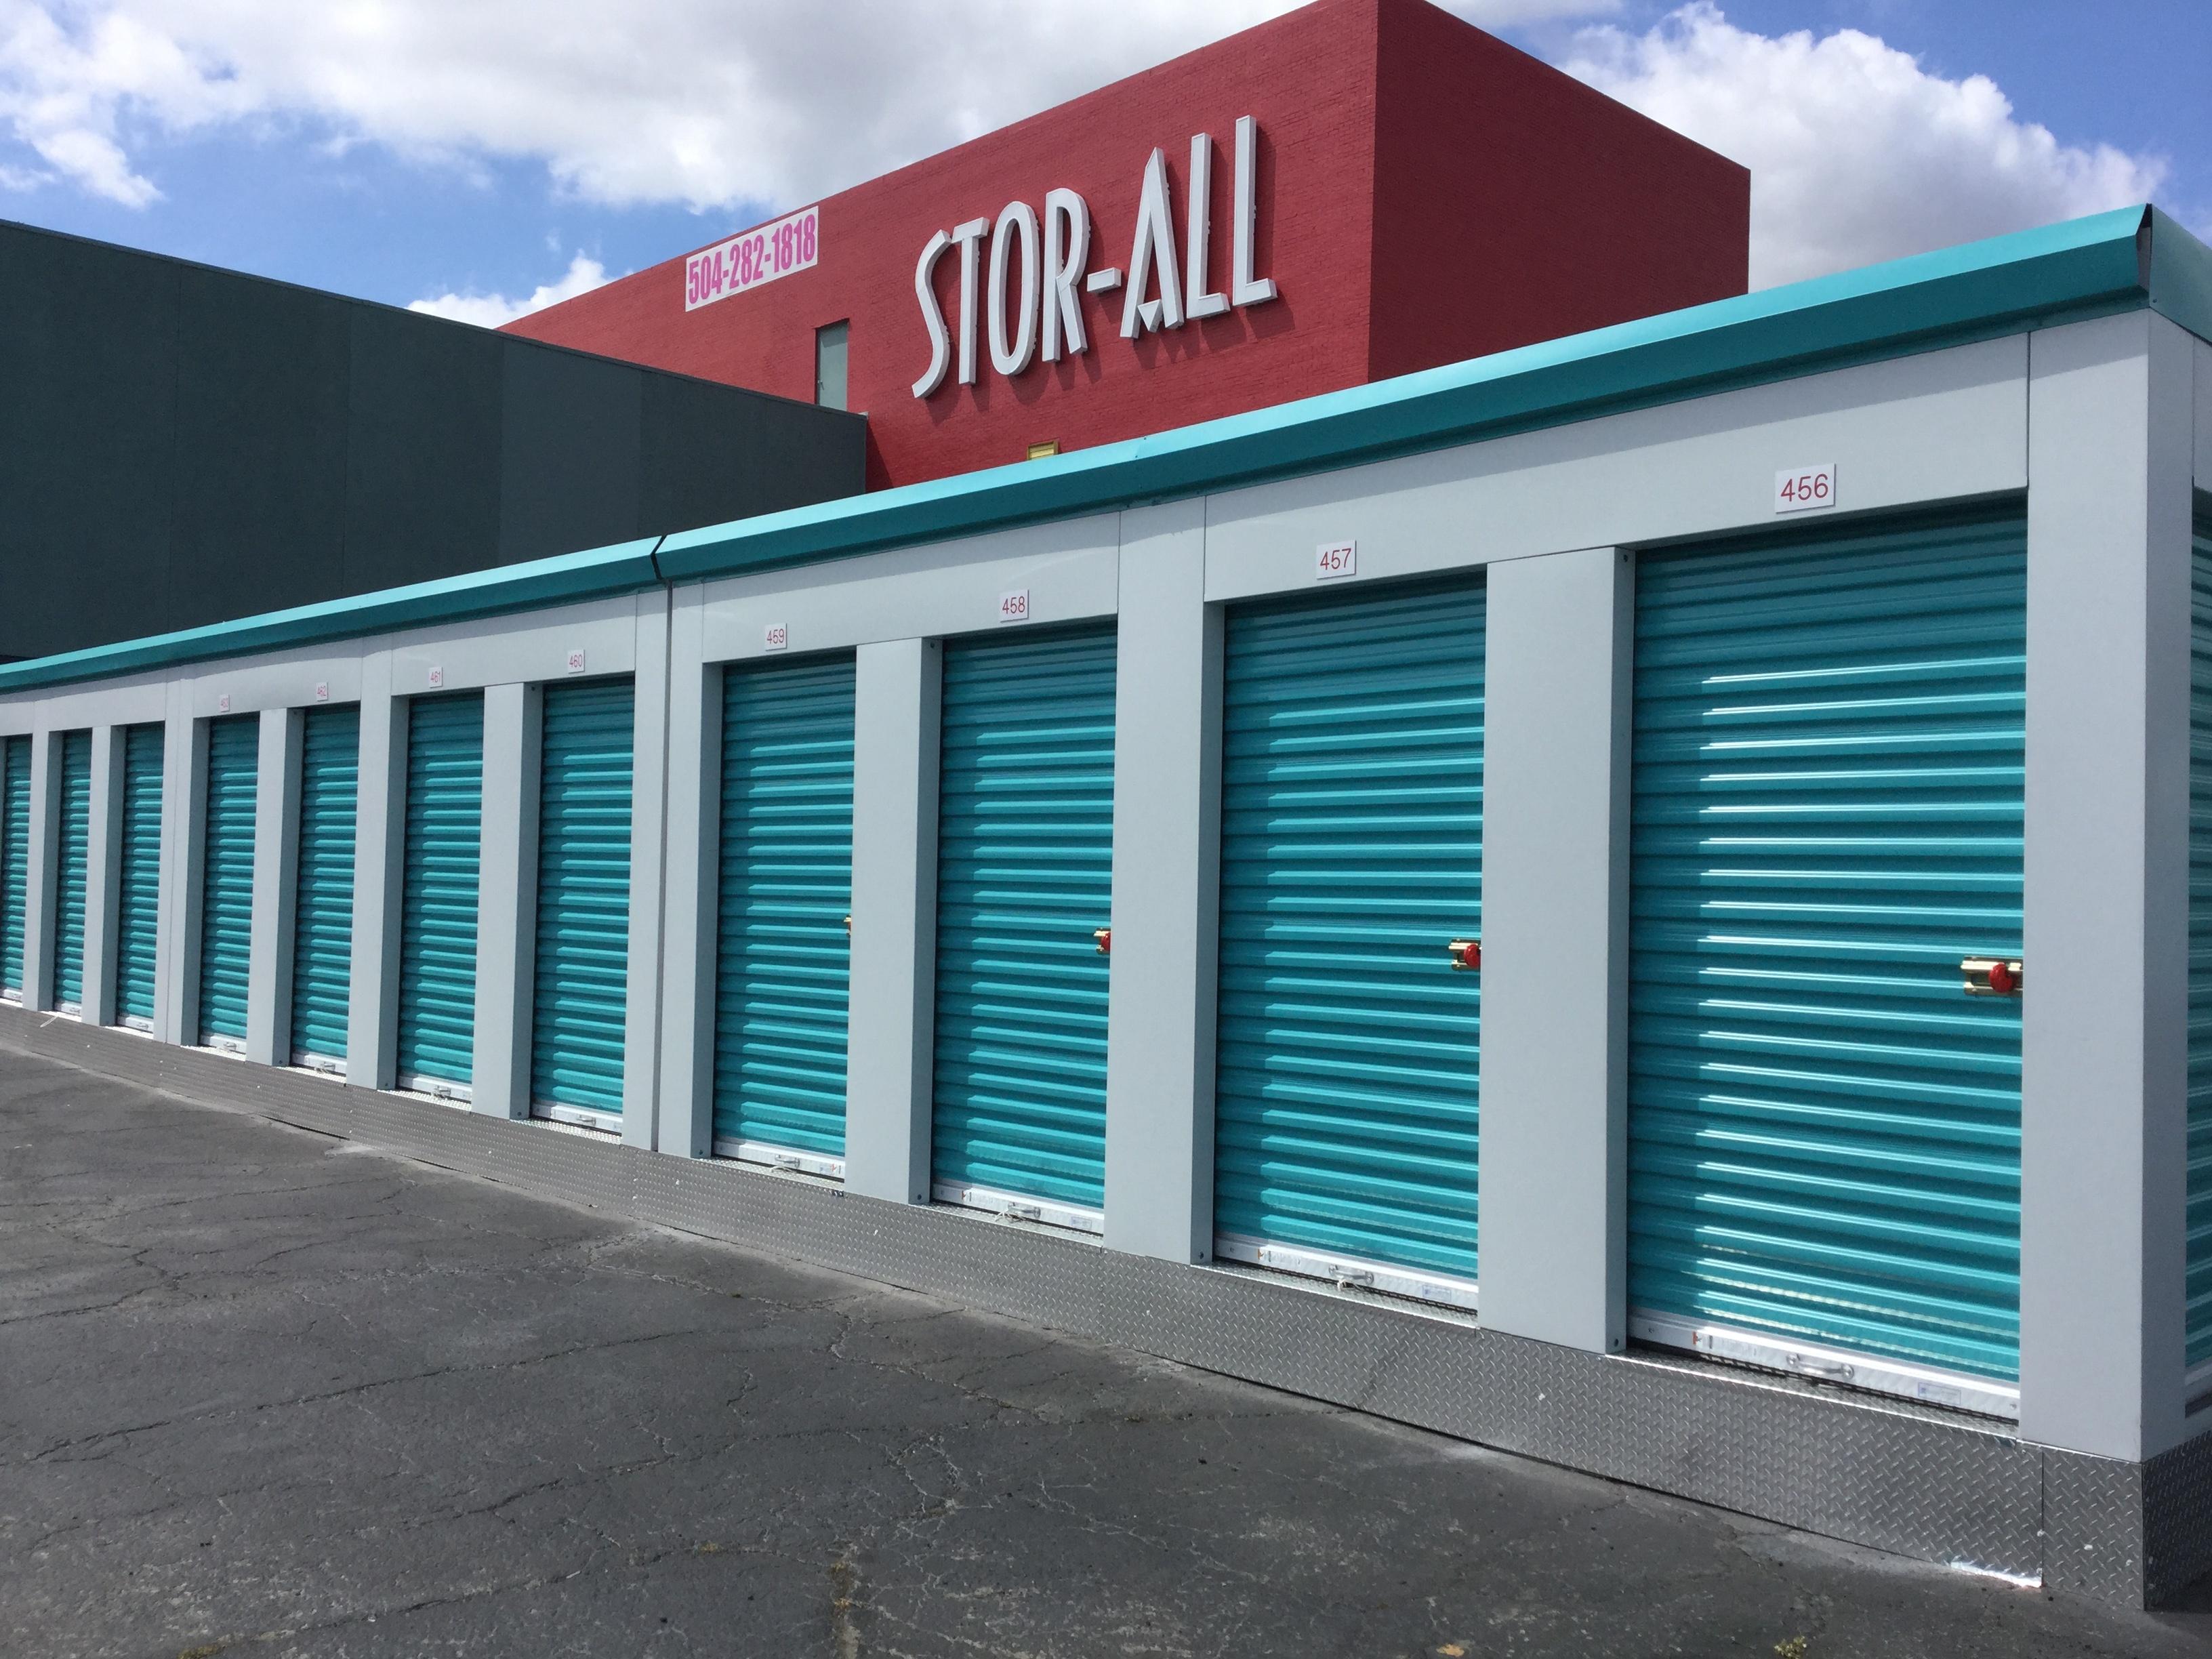 MASS Portable Storage Units at Stor-All Self-storage facility